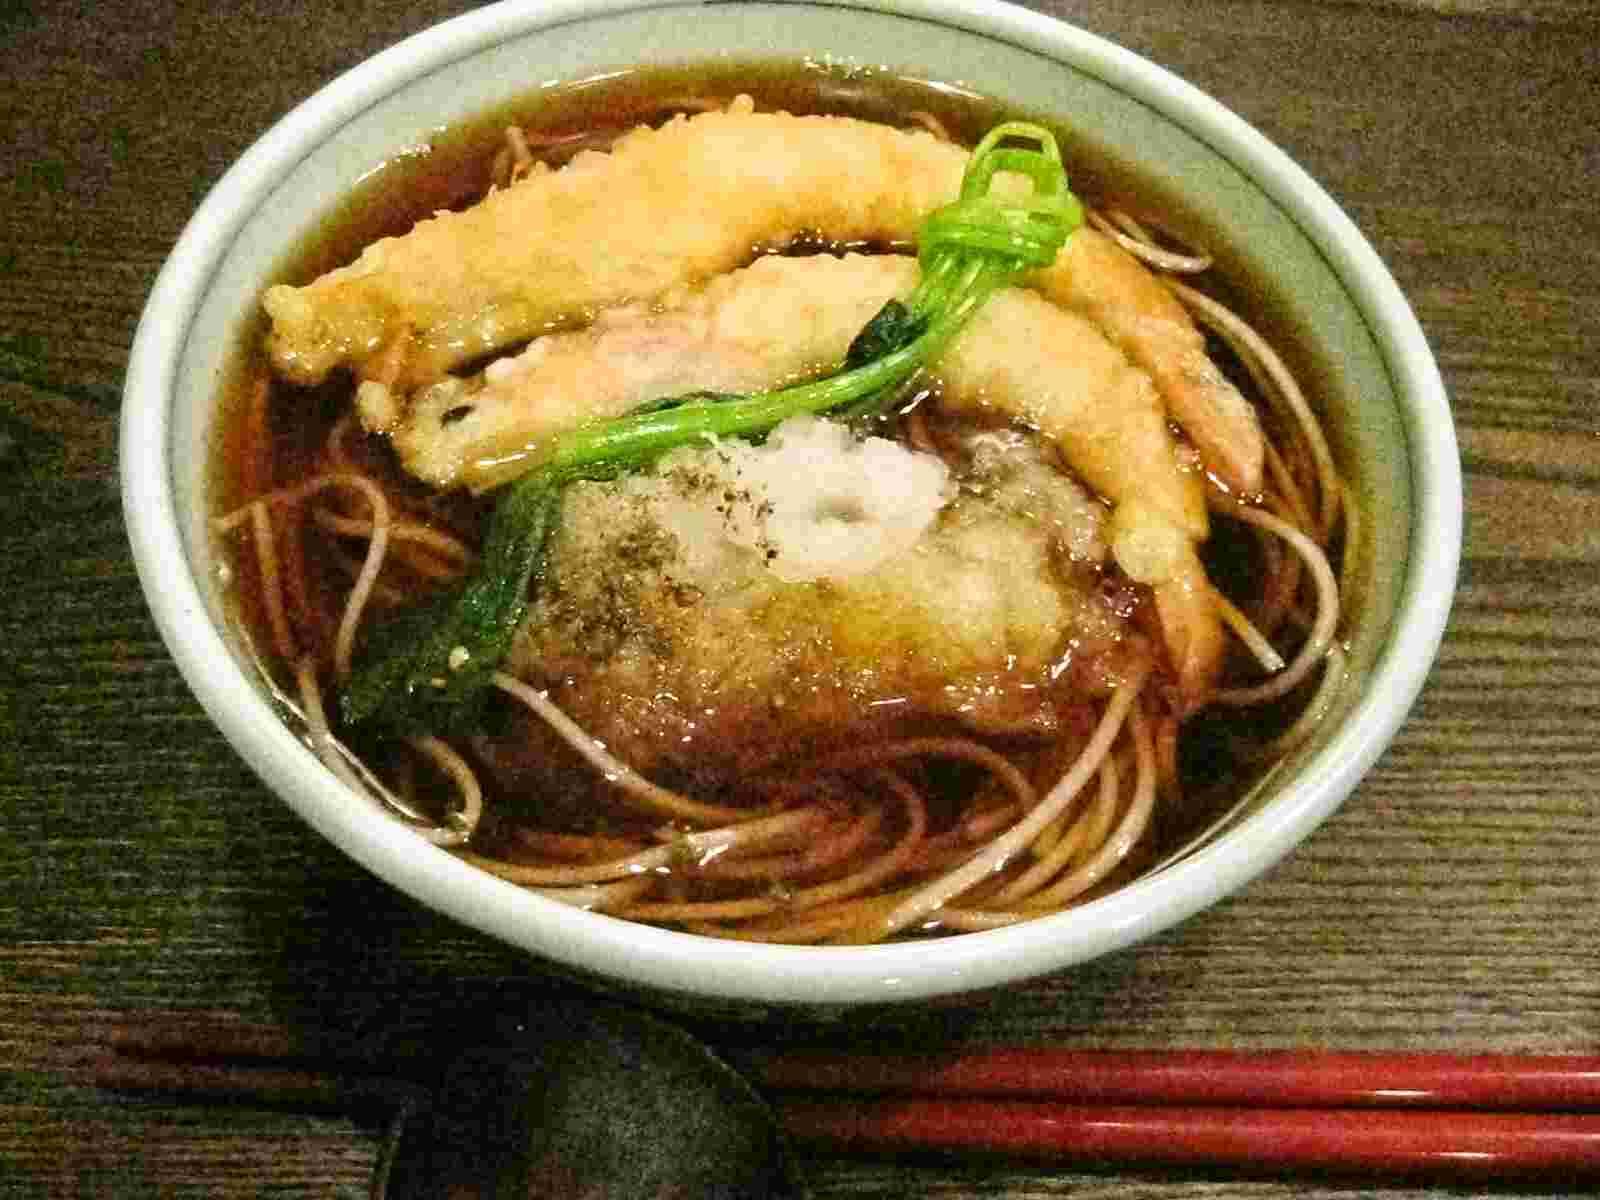 Last food of the year -- toshikoshi soba / year-end buckwheat noodles ...